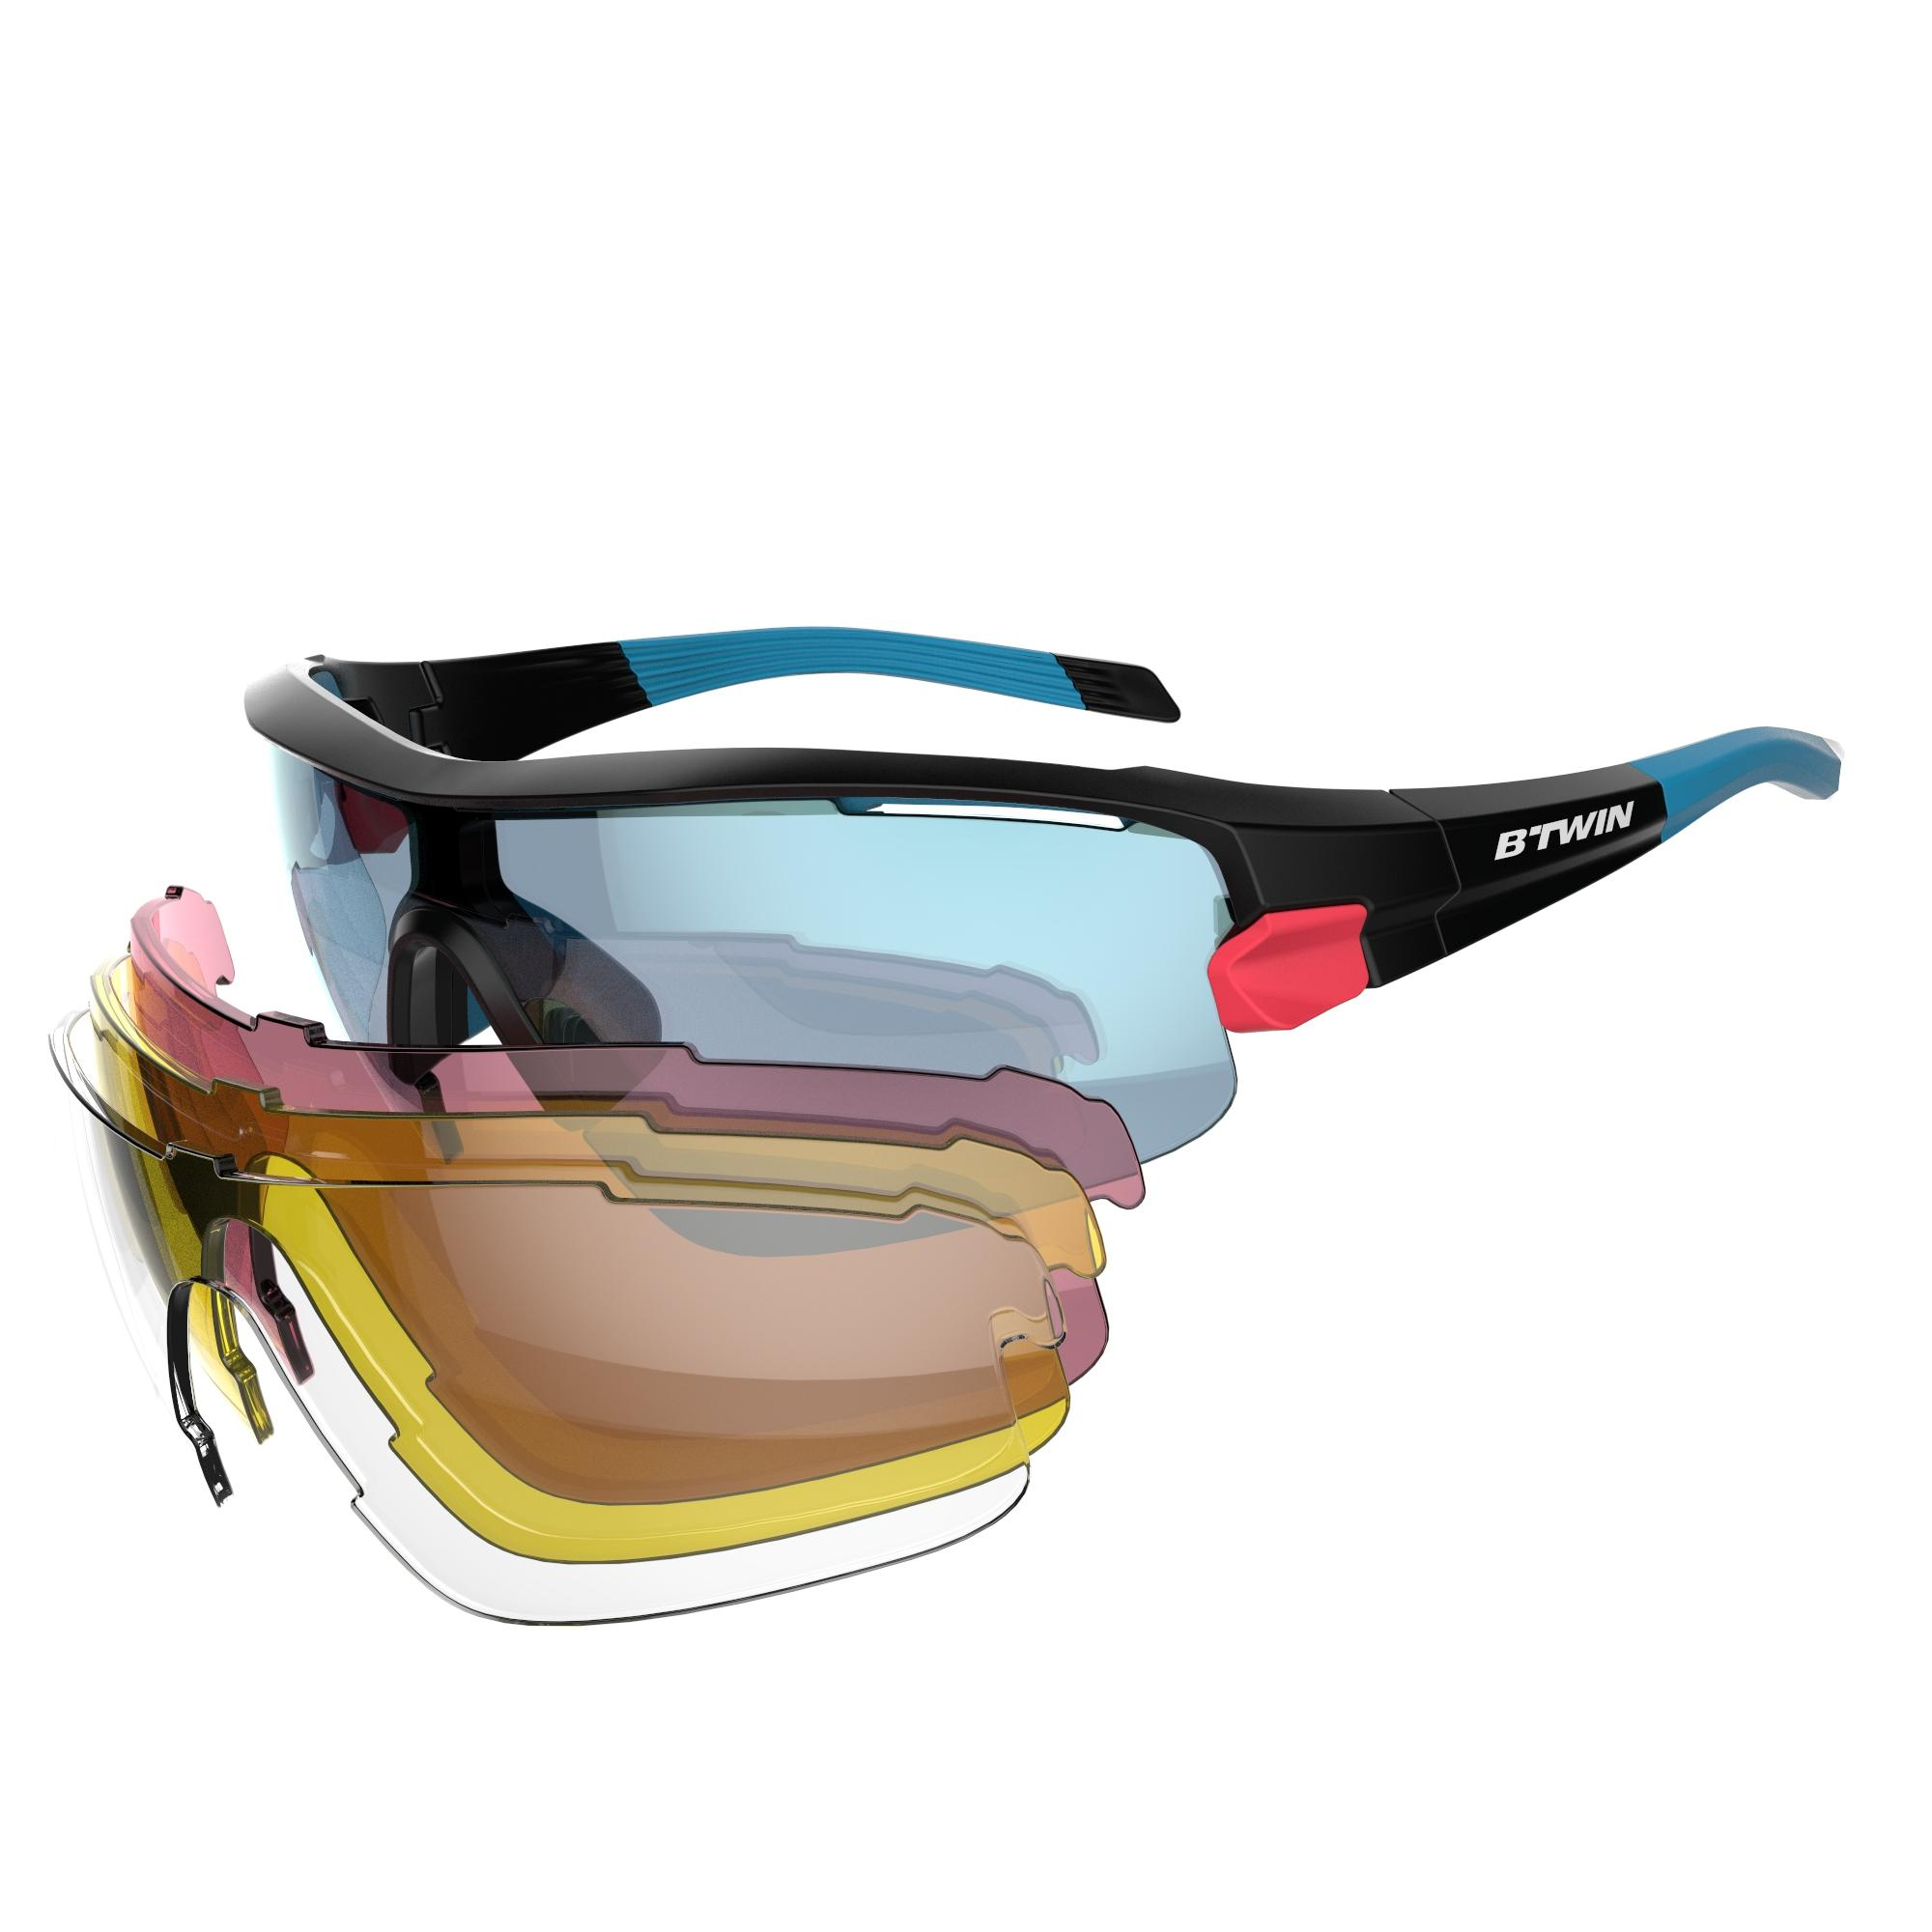 B'twin Fietsbril volwassenen Cycling 900 Grey Pack grijs - 4 verwisselbare glazen thumbnail